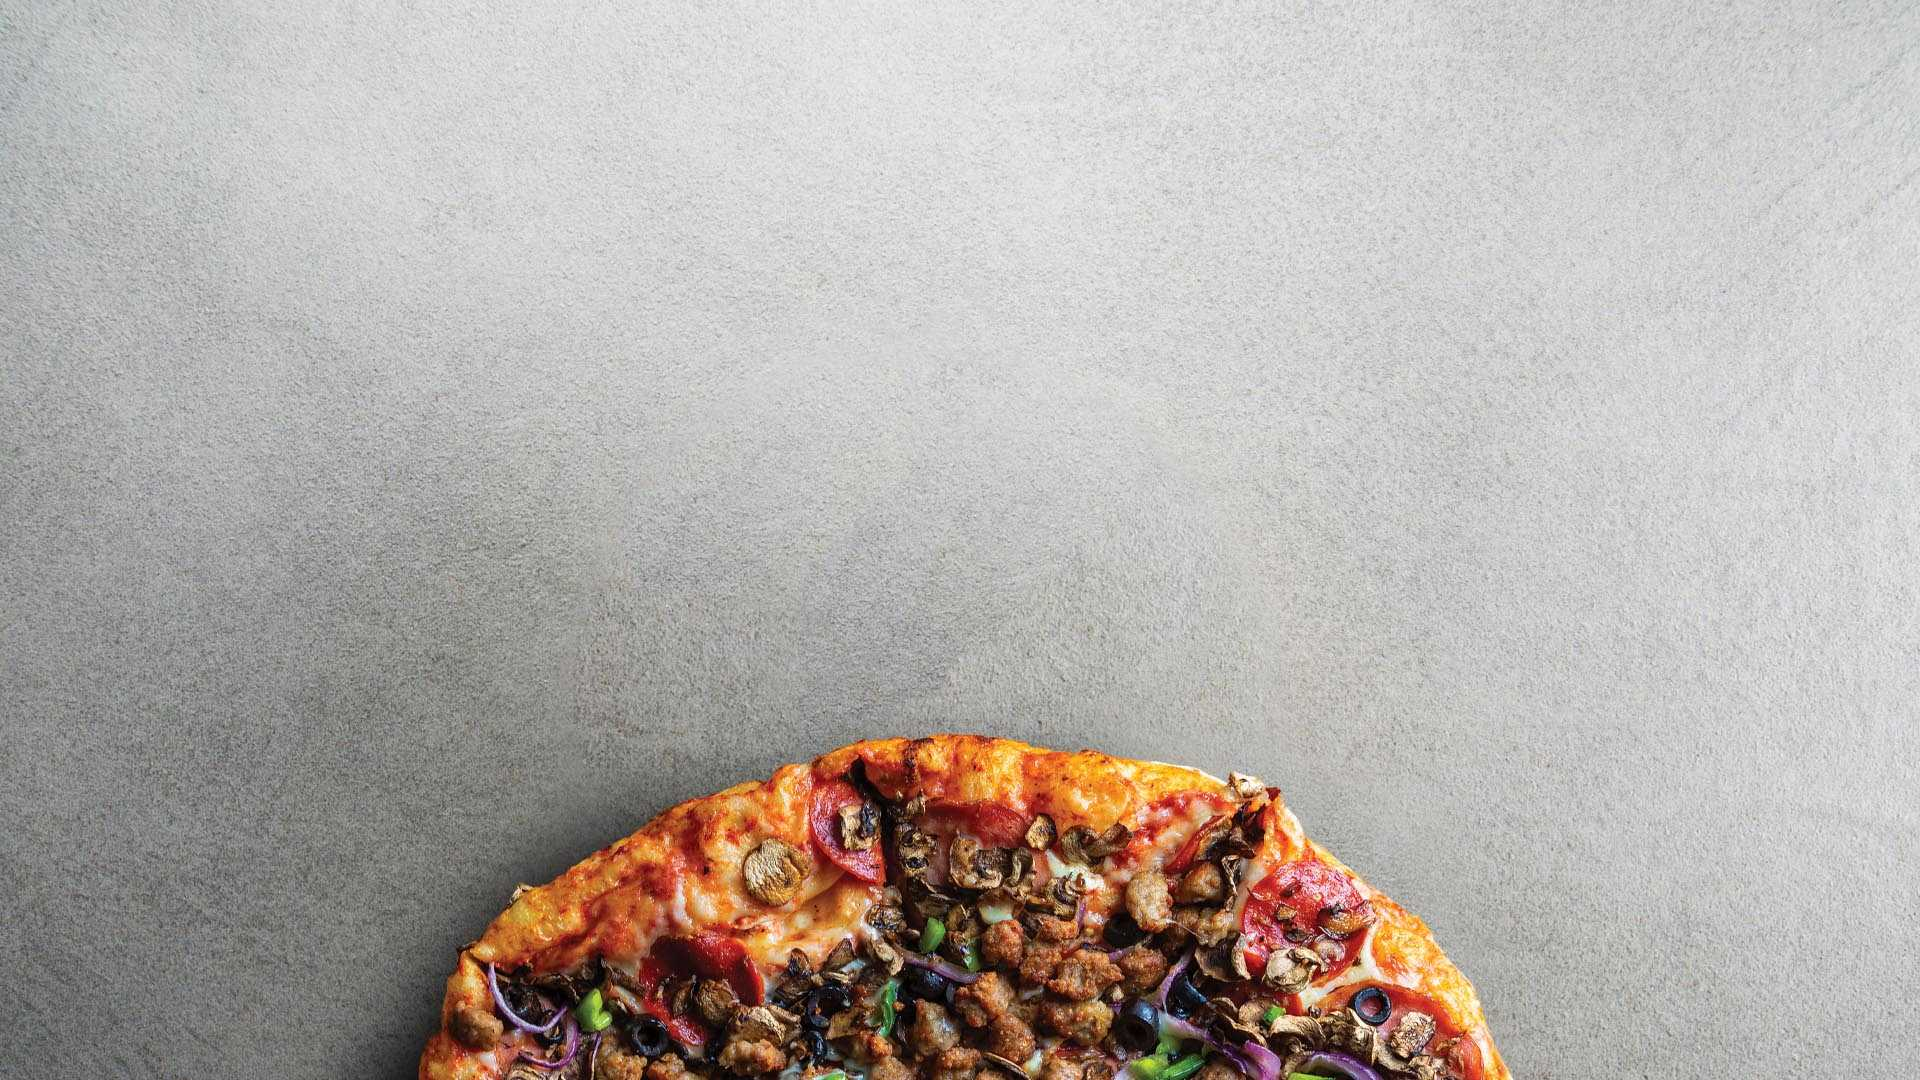 The Pizza Box A Milpitas Original Since 1986